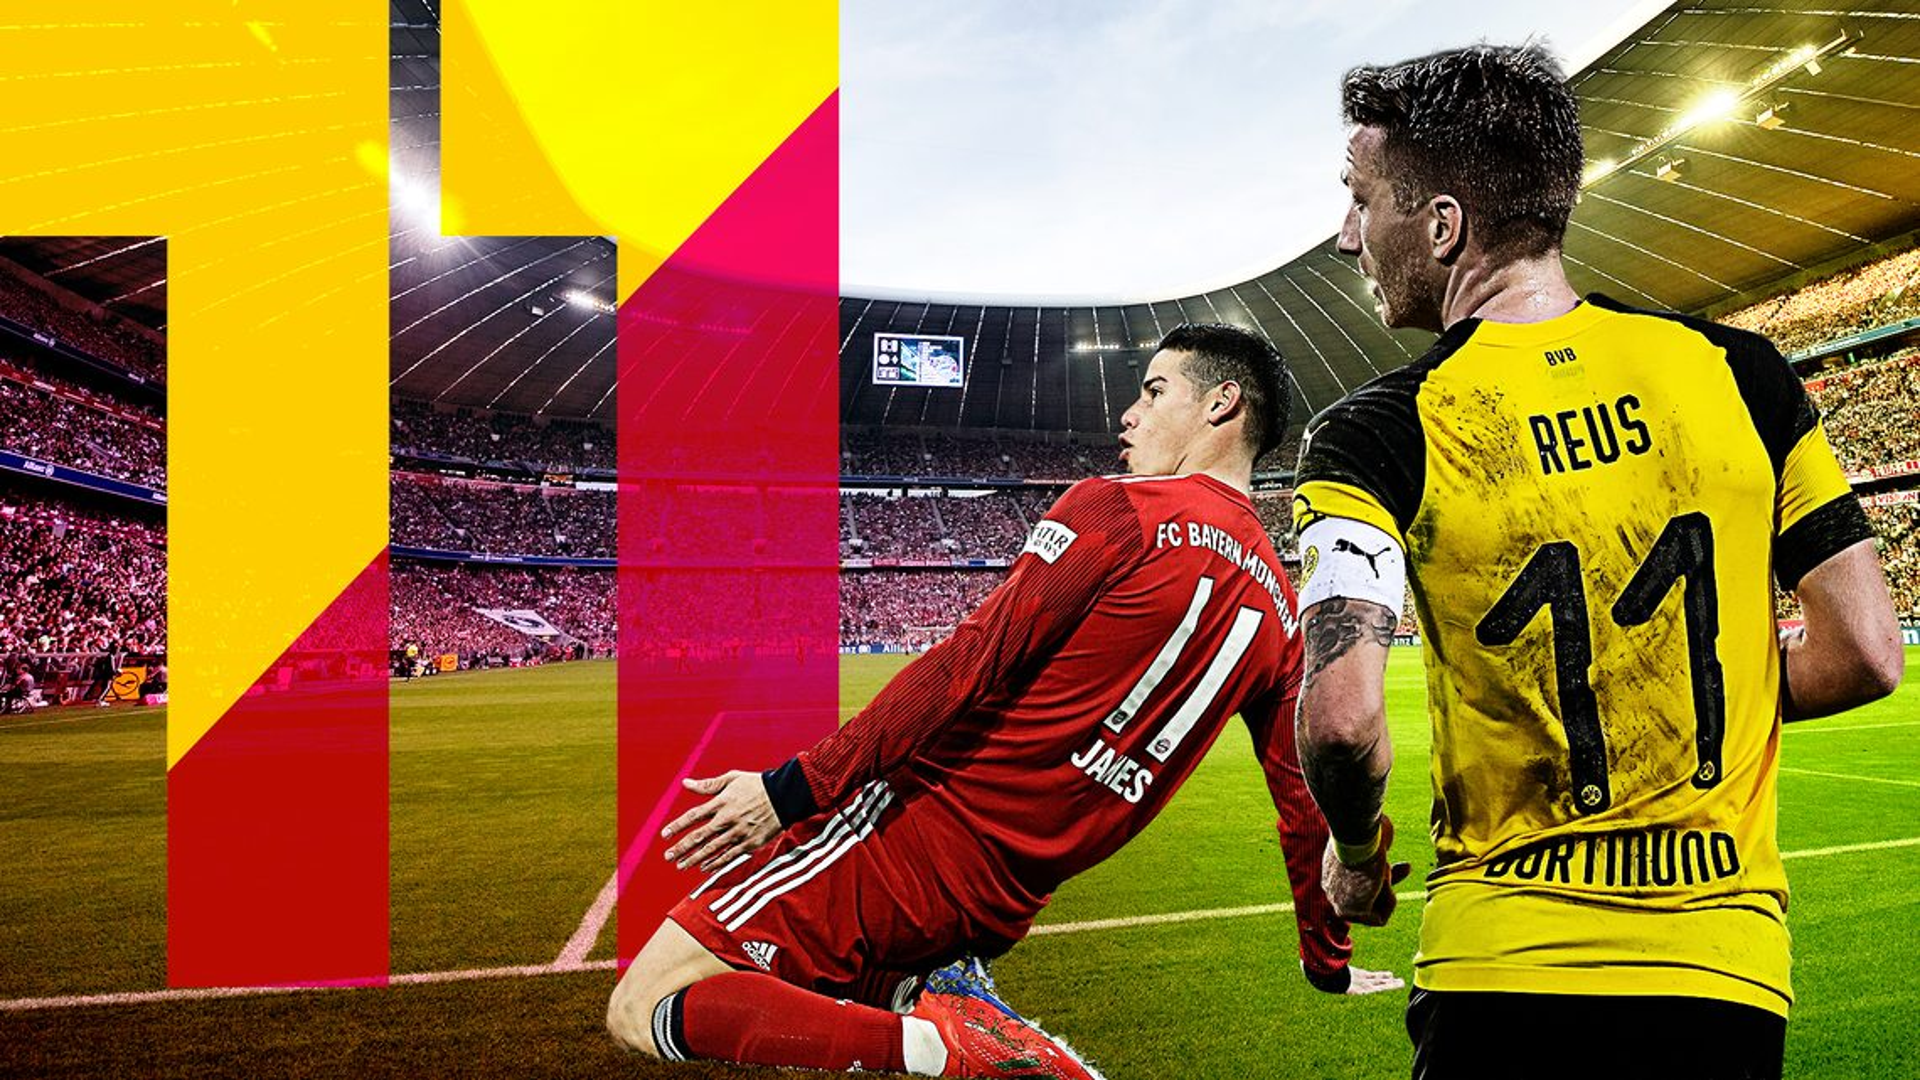 finest selection 005d5 c67d6 Bundesliga | James Rodriguez or Marco Reus? A combined ...